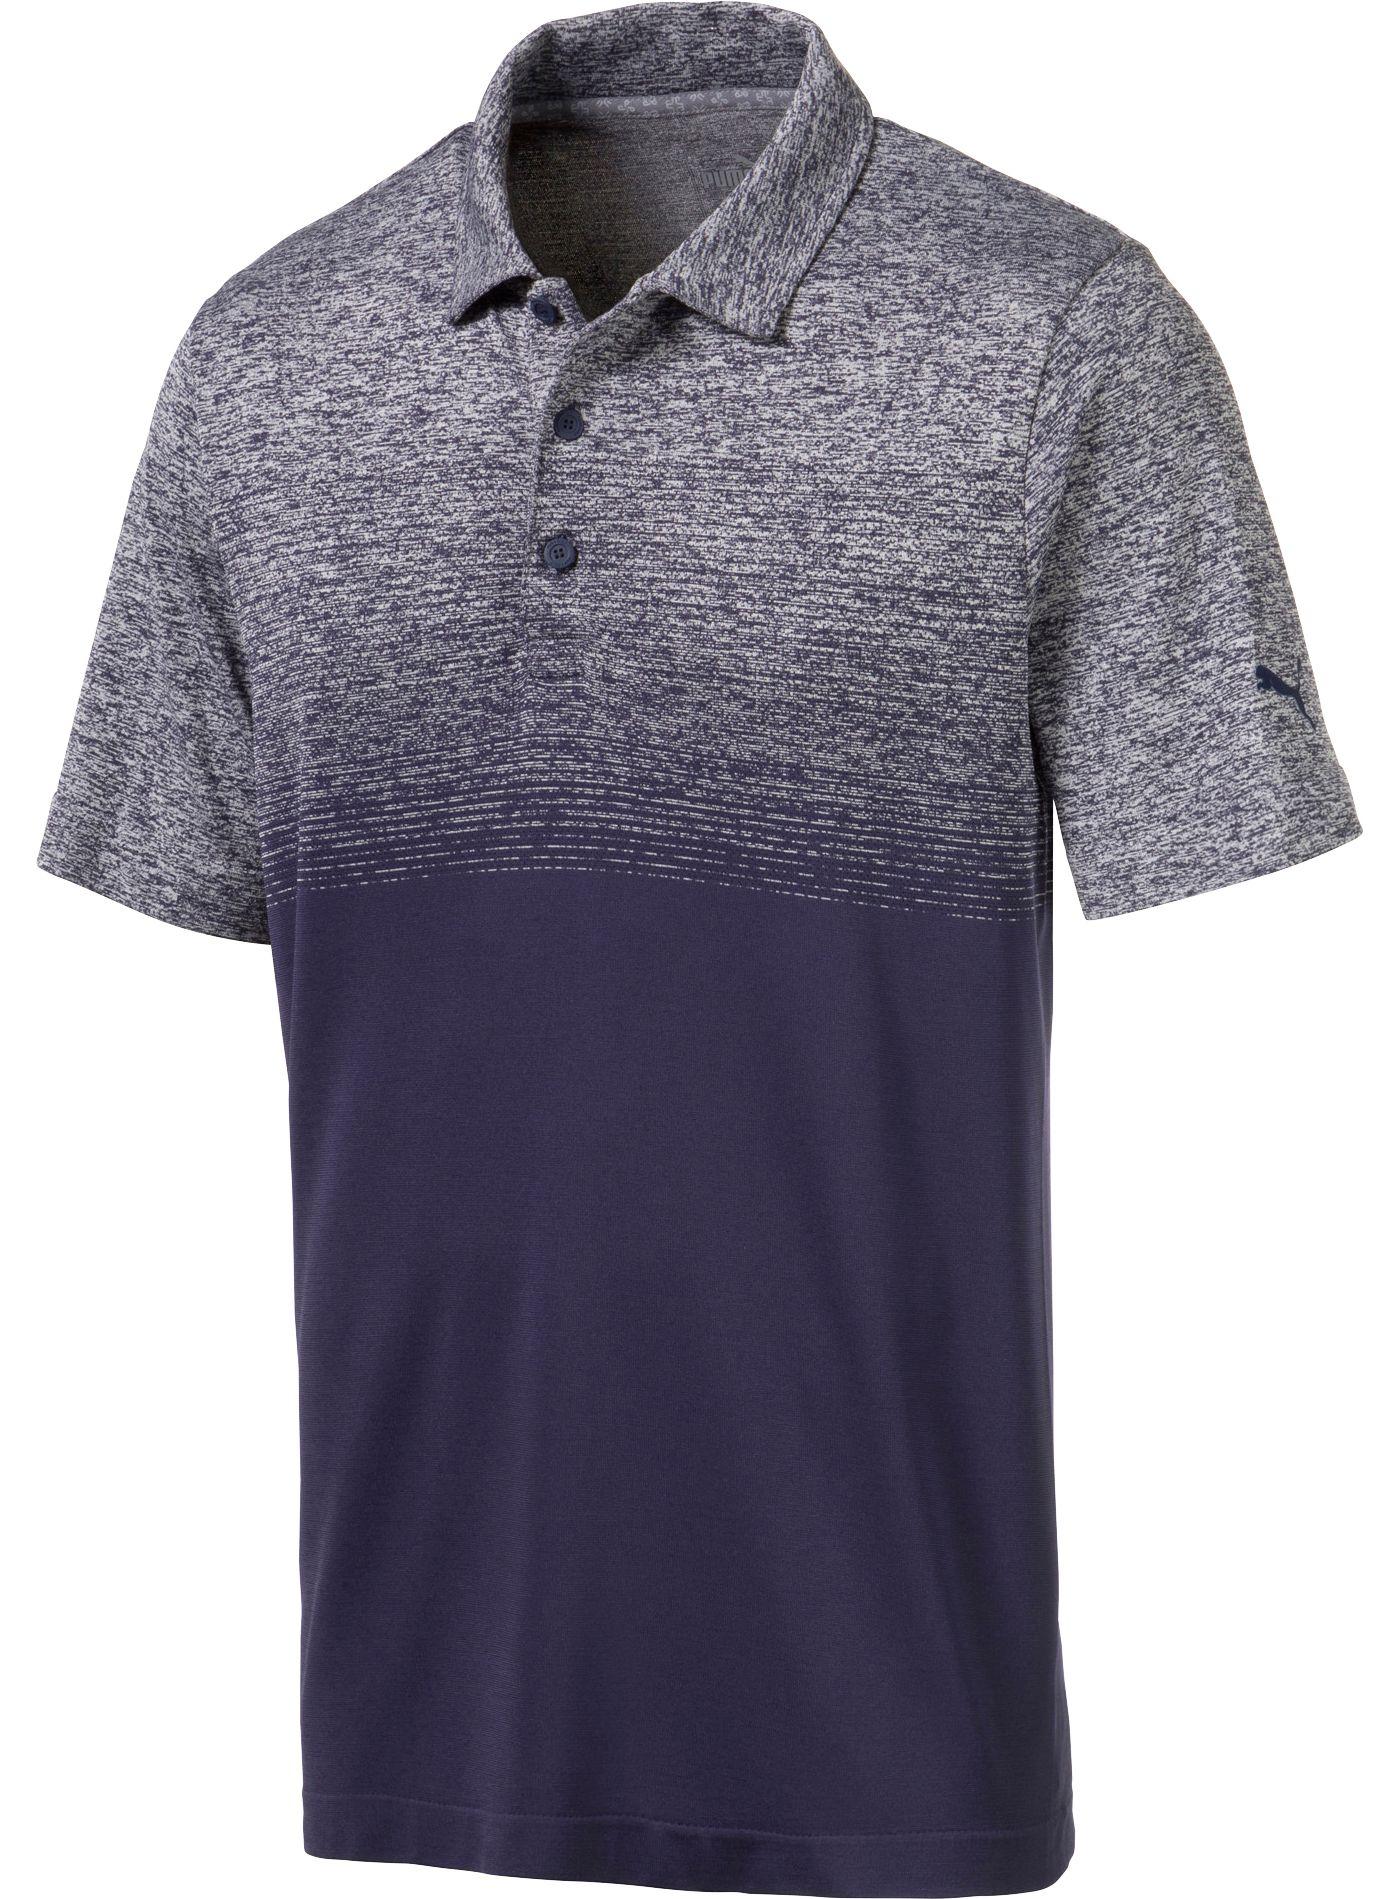 PUMA Men's Evoknit Ombre Golf Polo